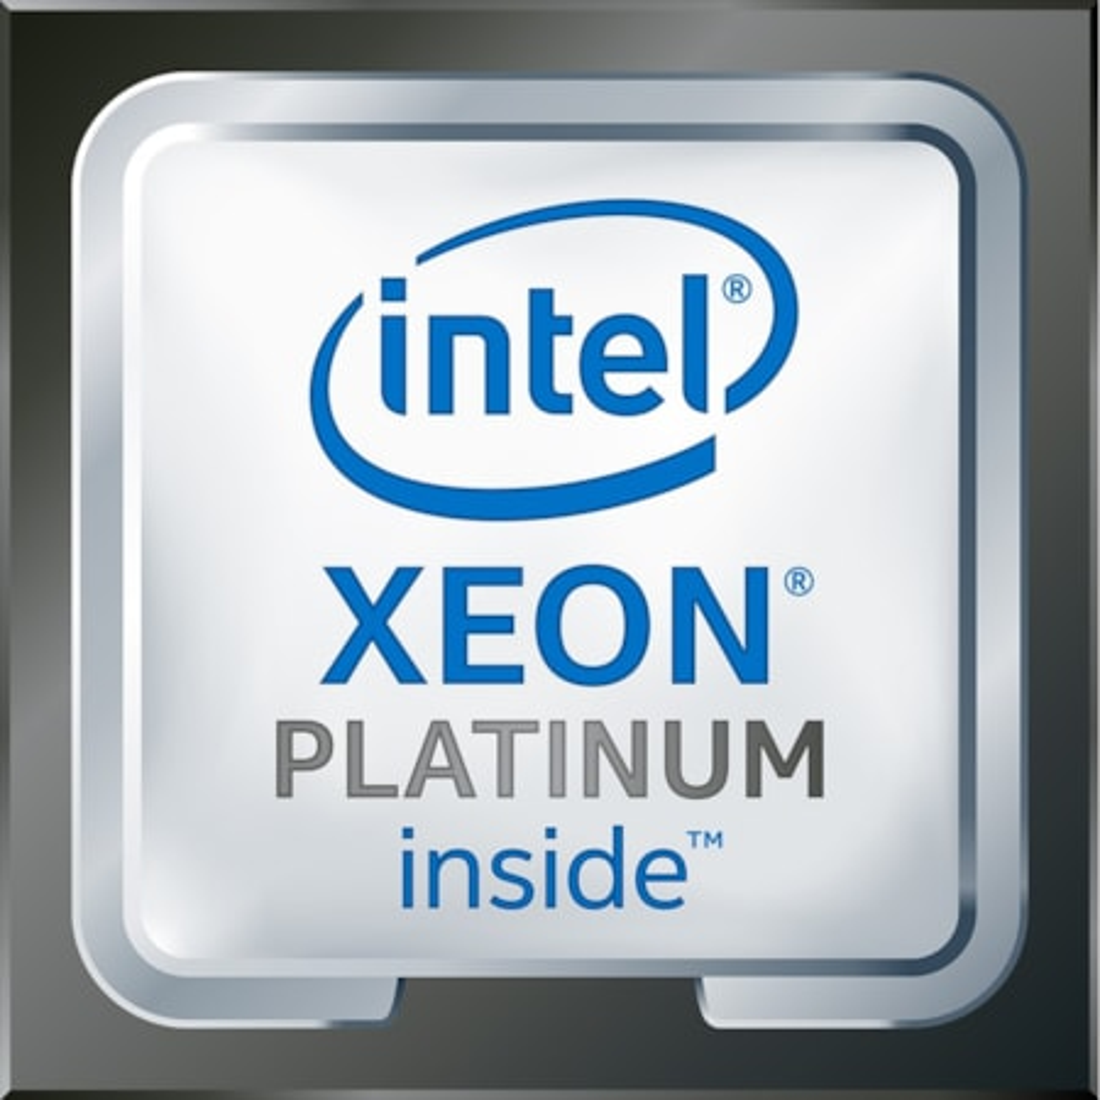 HPE Intel Xeon Platinum 8280 Octacosa-core (28 Core) 2.70 GHz Processor Upgrade